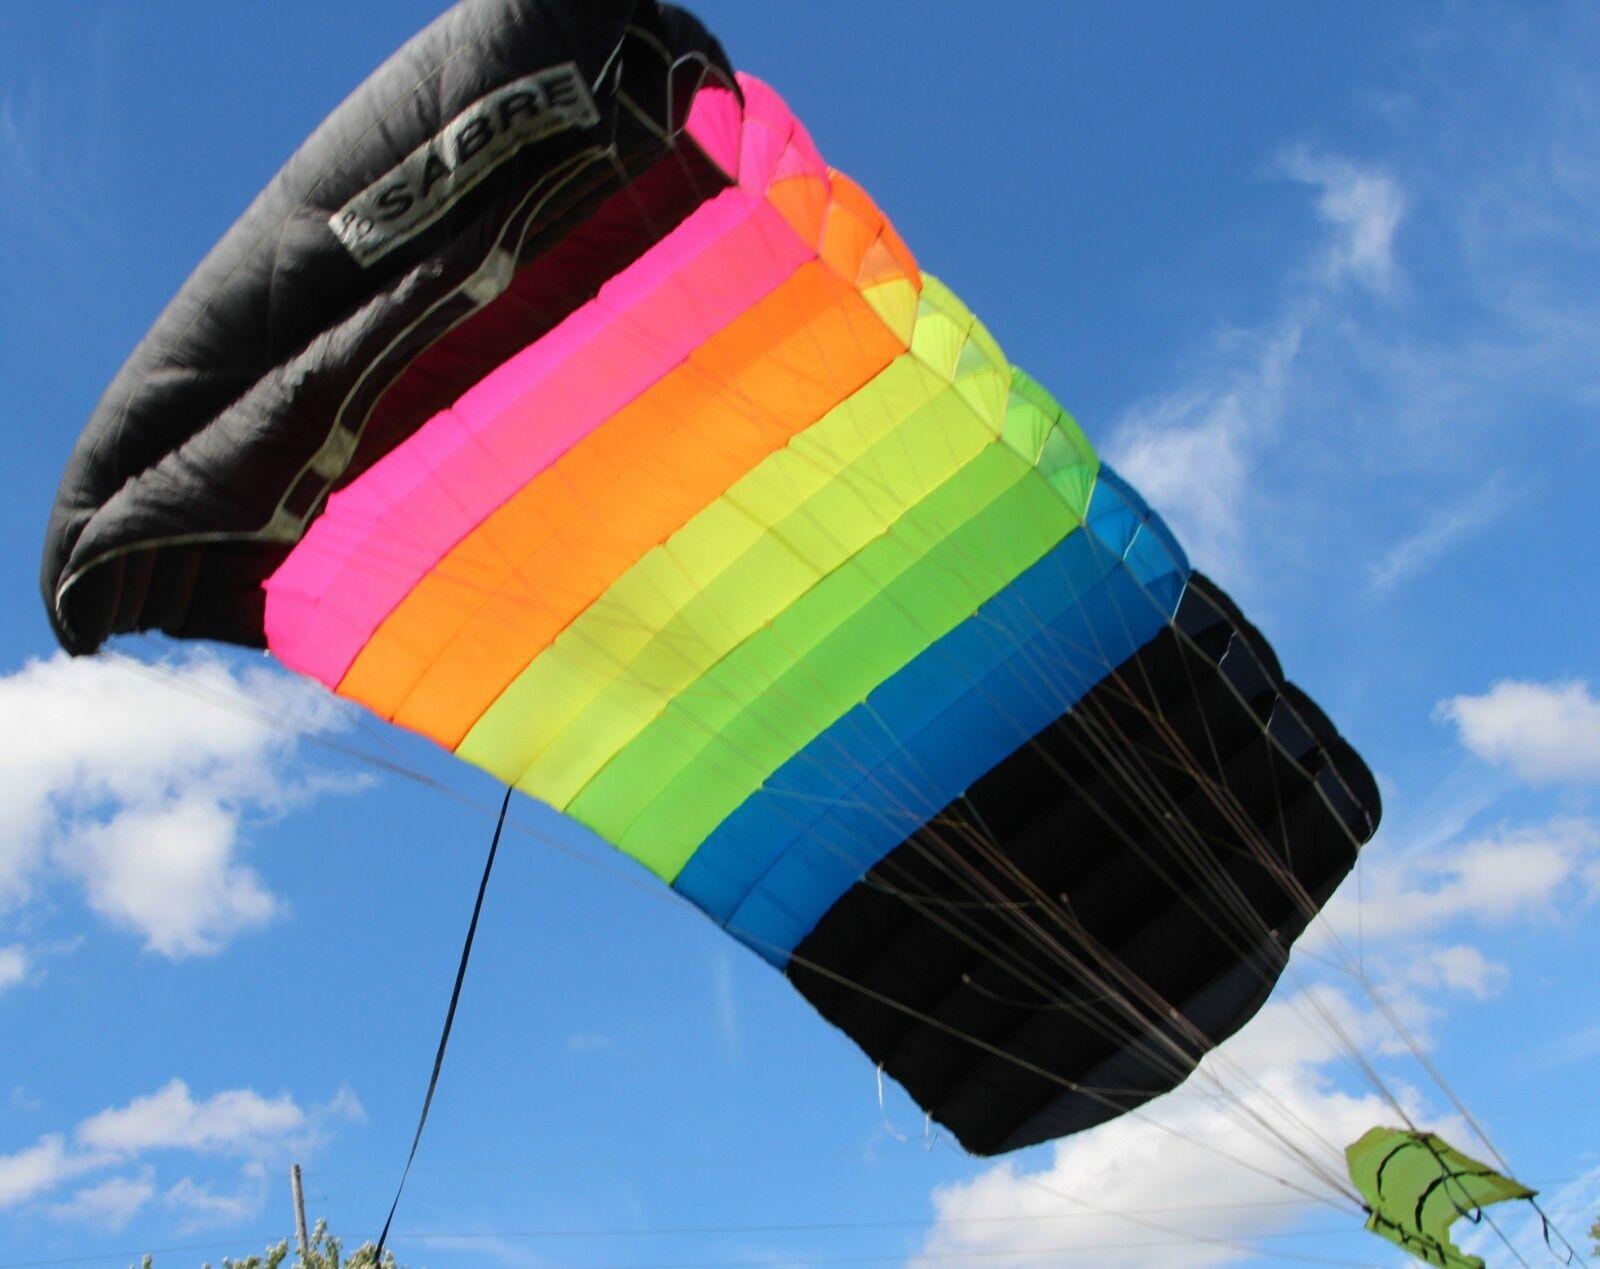 Racer Elite skydiving parachute rig   Sabre 135 main   MicroRaven150 reserve